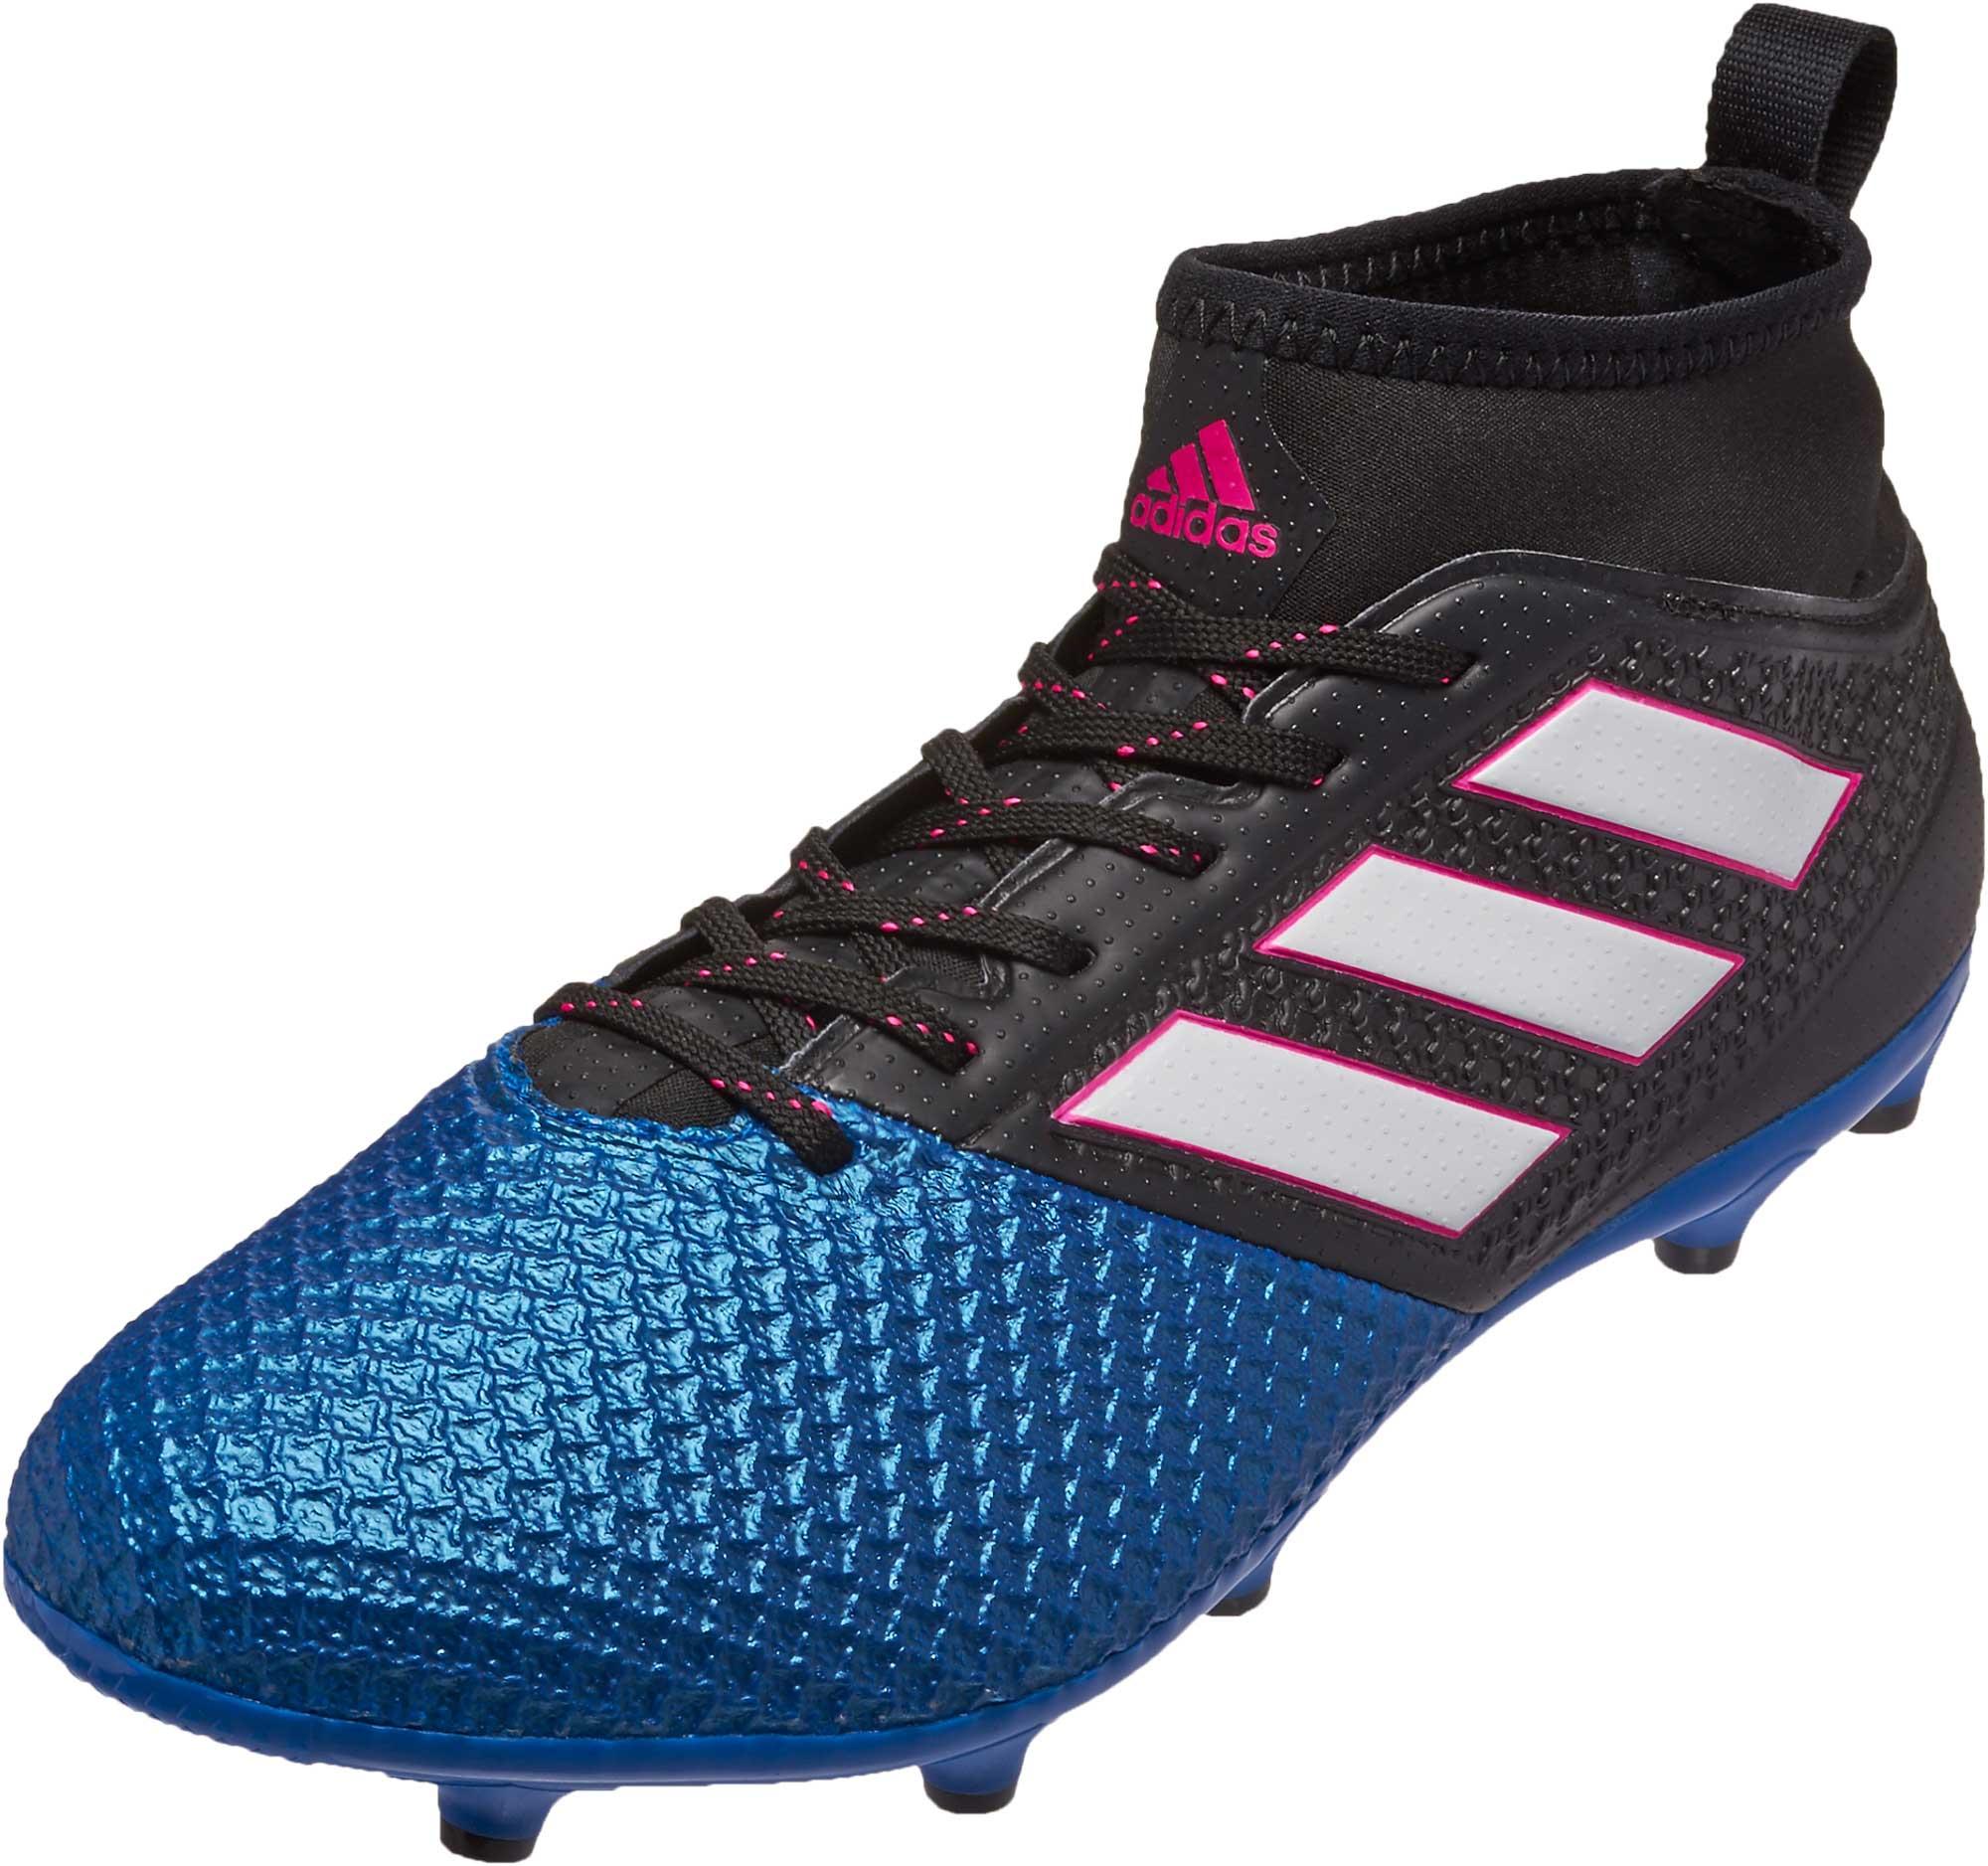 43b62c8ba2d adidas ACE 17.3 Primemesh FG Soccer Cleats - Black